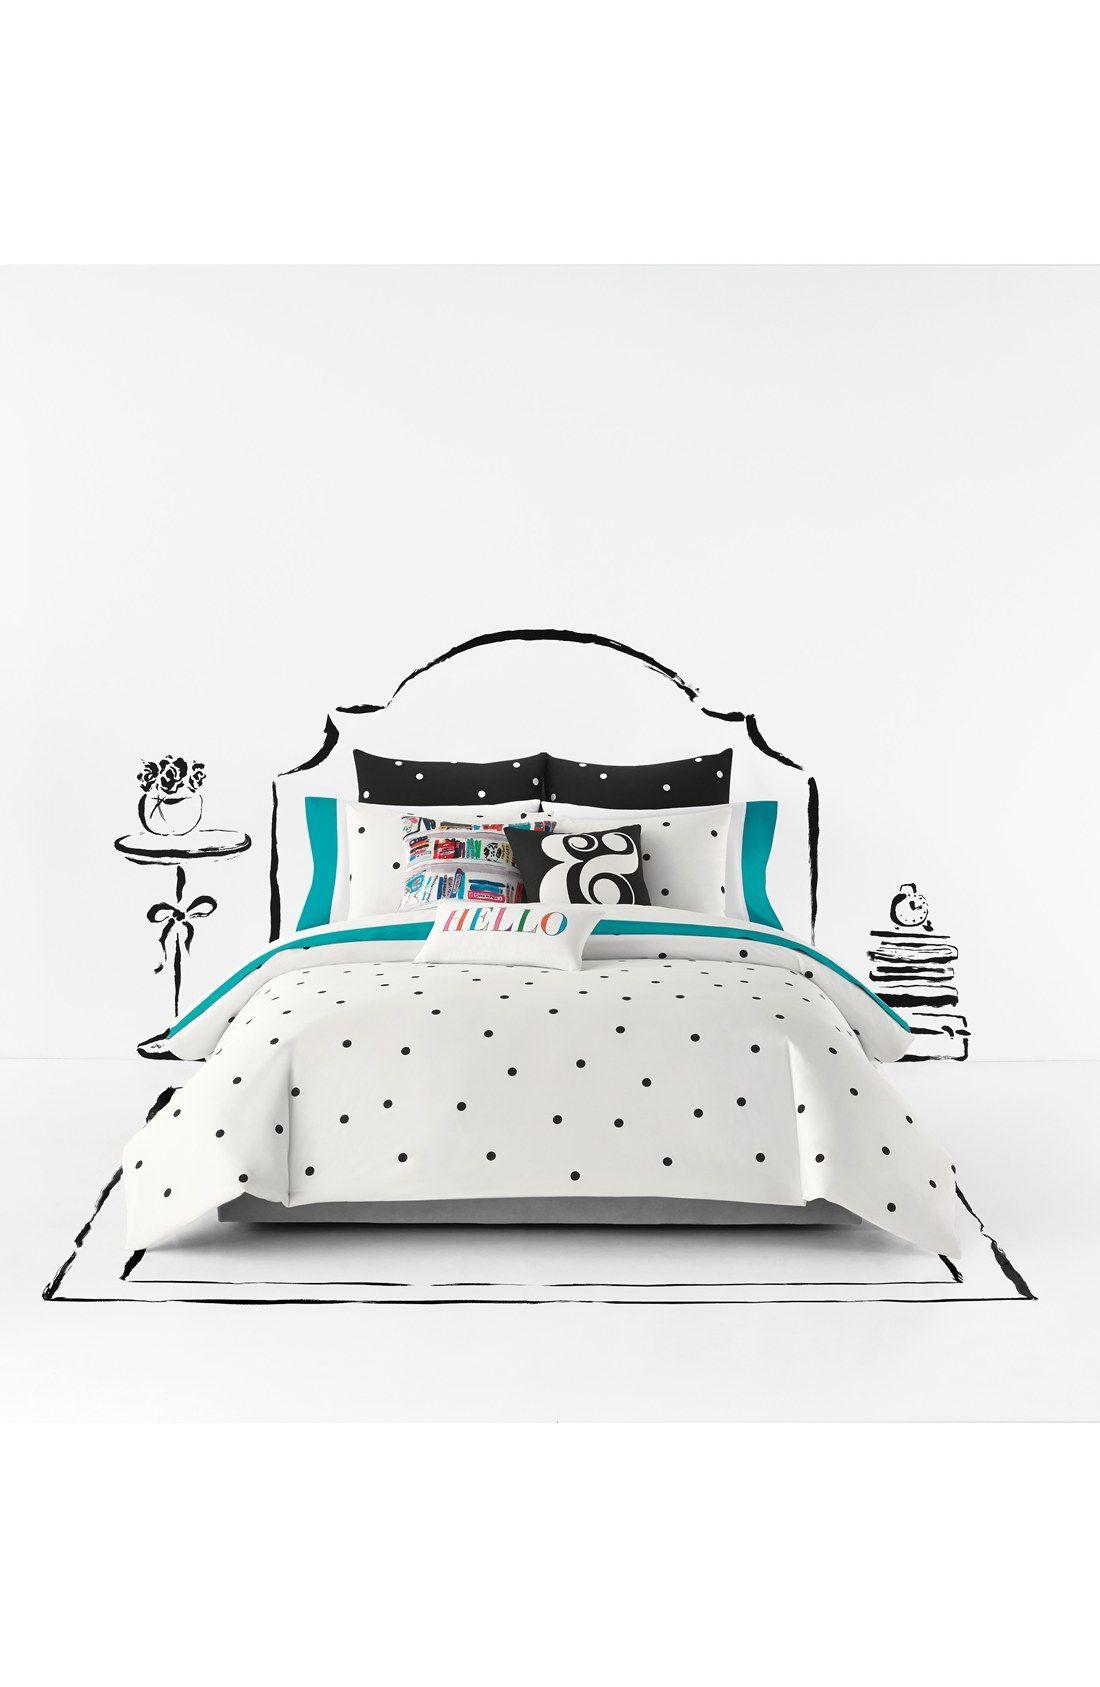 fil dot pillow set itm duvet polka quilt a on bfca cover woven case dots bedding end